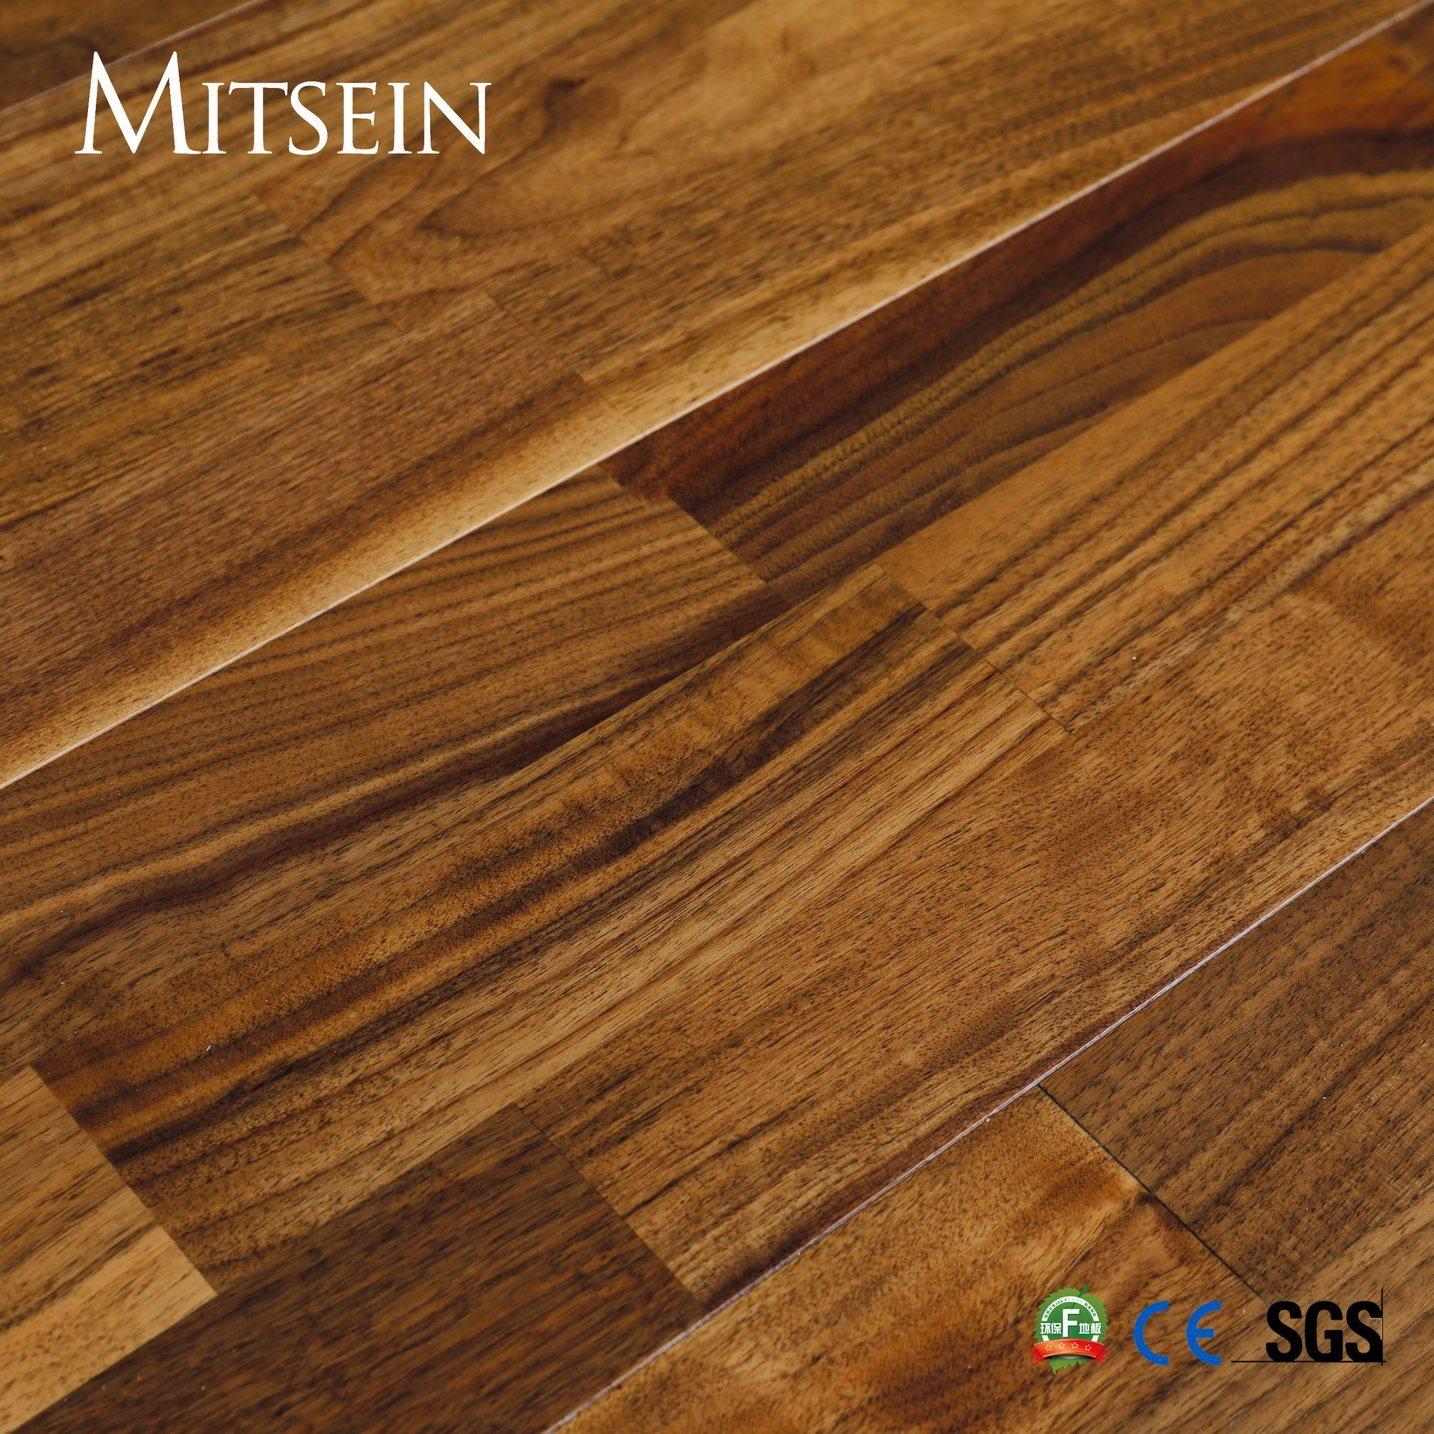 Layer Engineered Wood Flooring, 14mm Thick Laminate Flooring